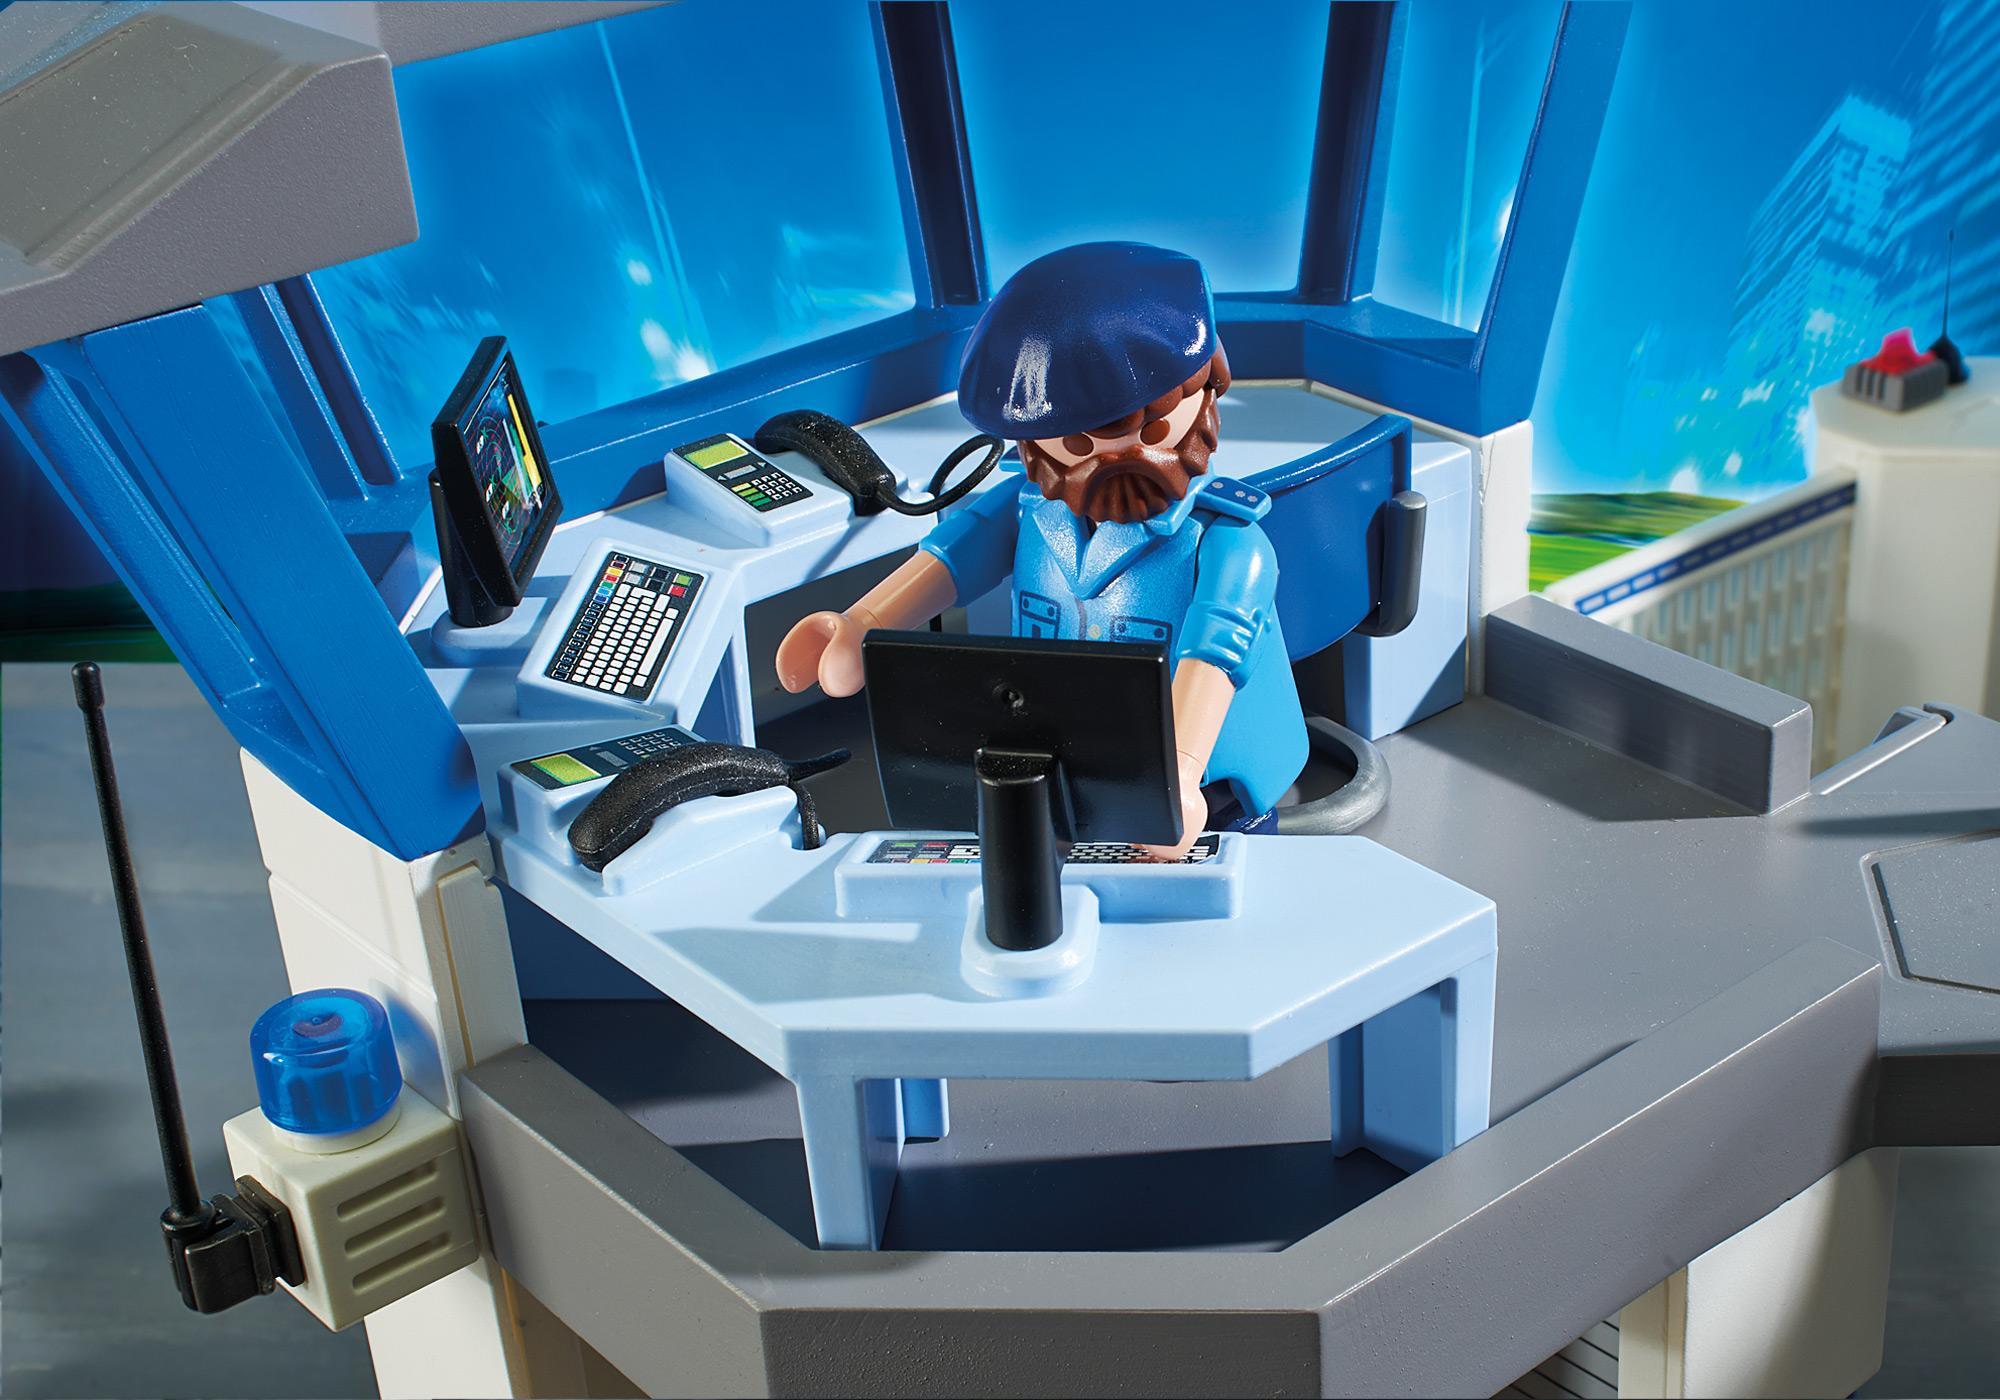 http://media.playmobil.com/i/playmobil/6919_product_extra5/Int. Polizei-Kommandozentrale mit Gefängnis